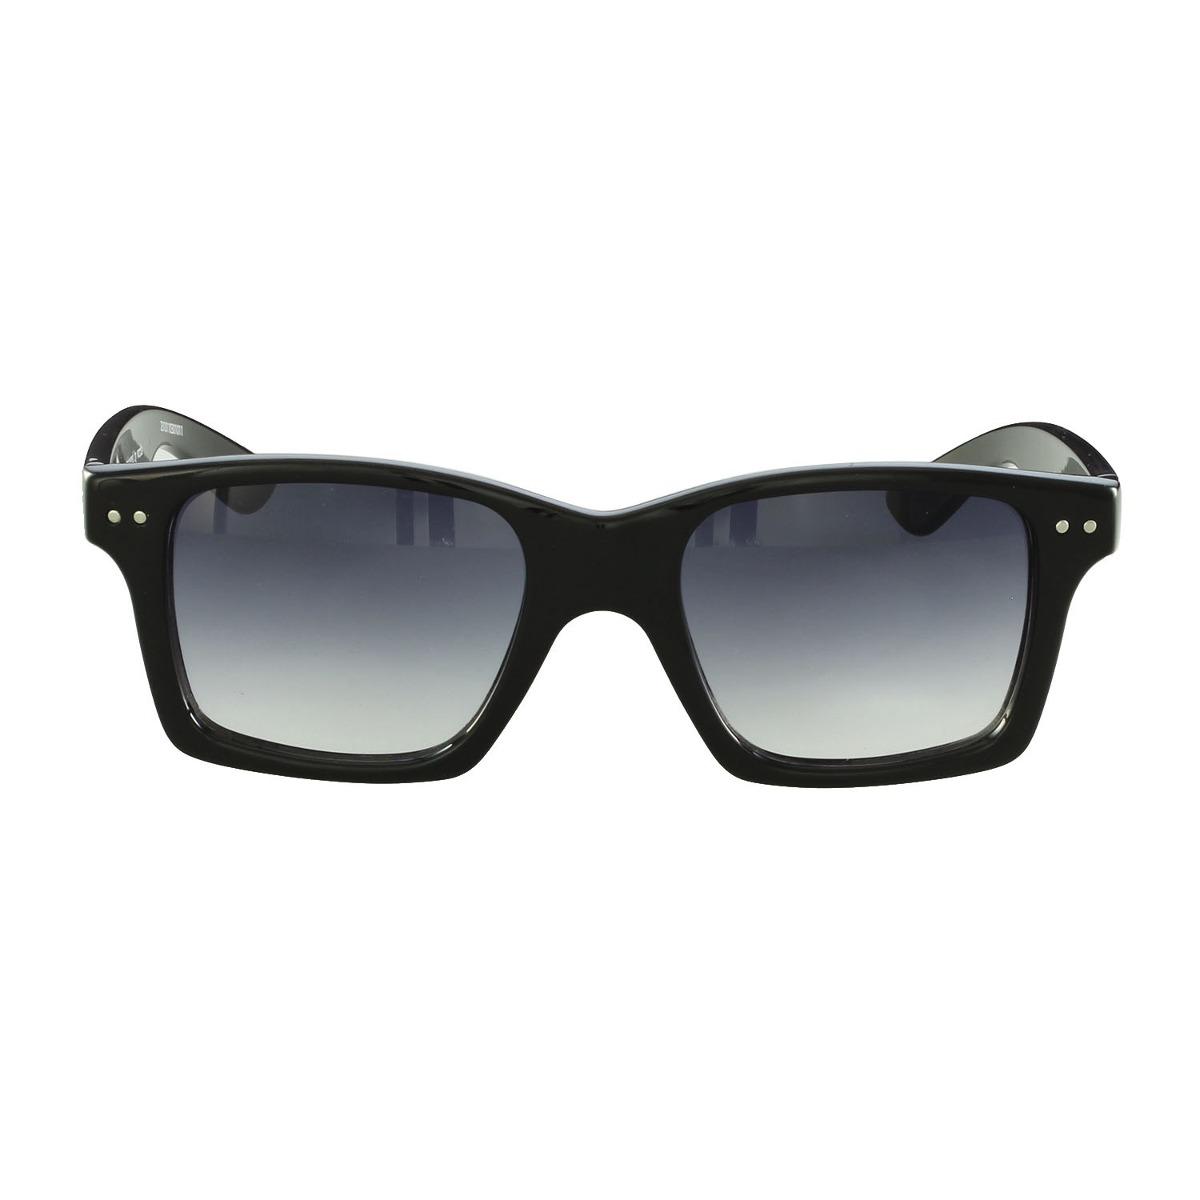 Óculos De Sol Evoke Casual Preto - R  370,00 em Mercado Livre 416d690b02